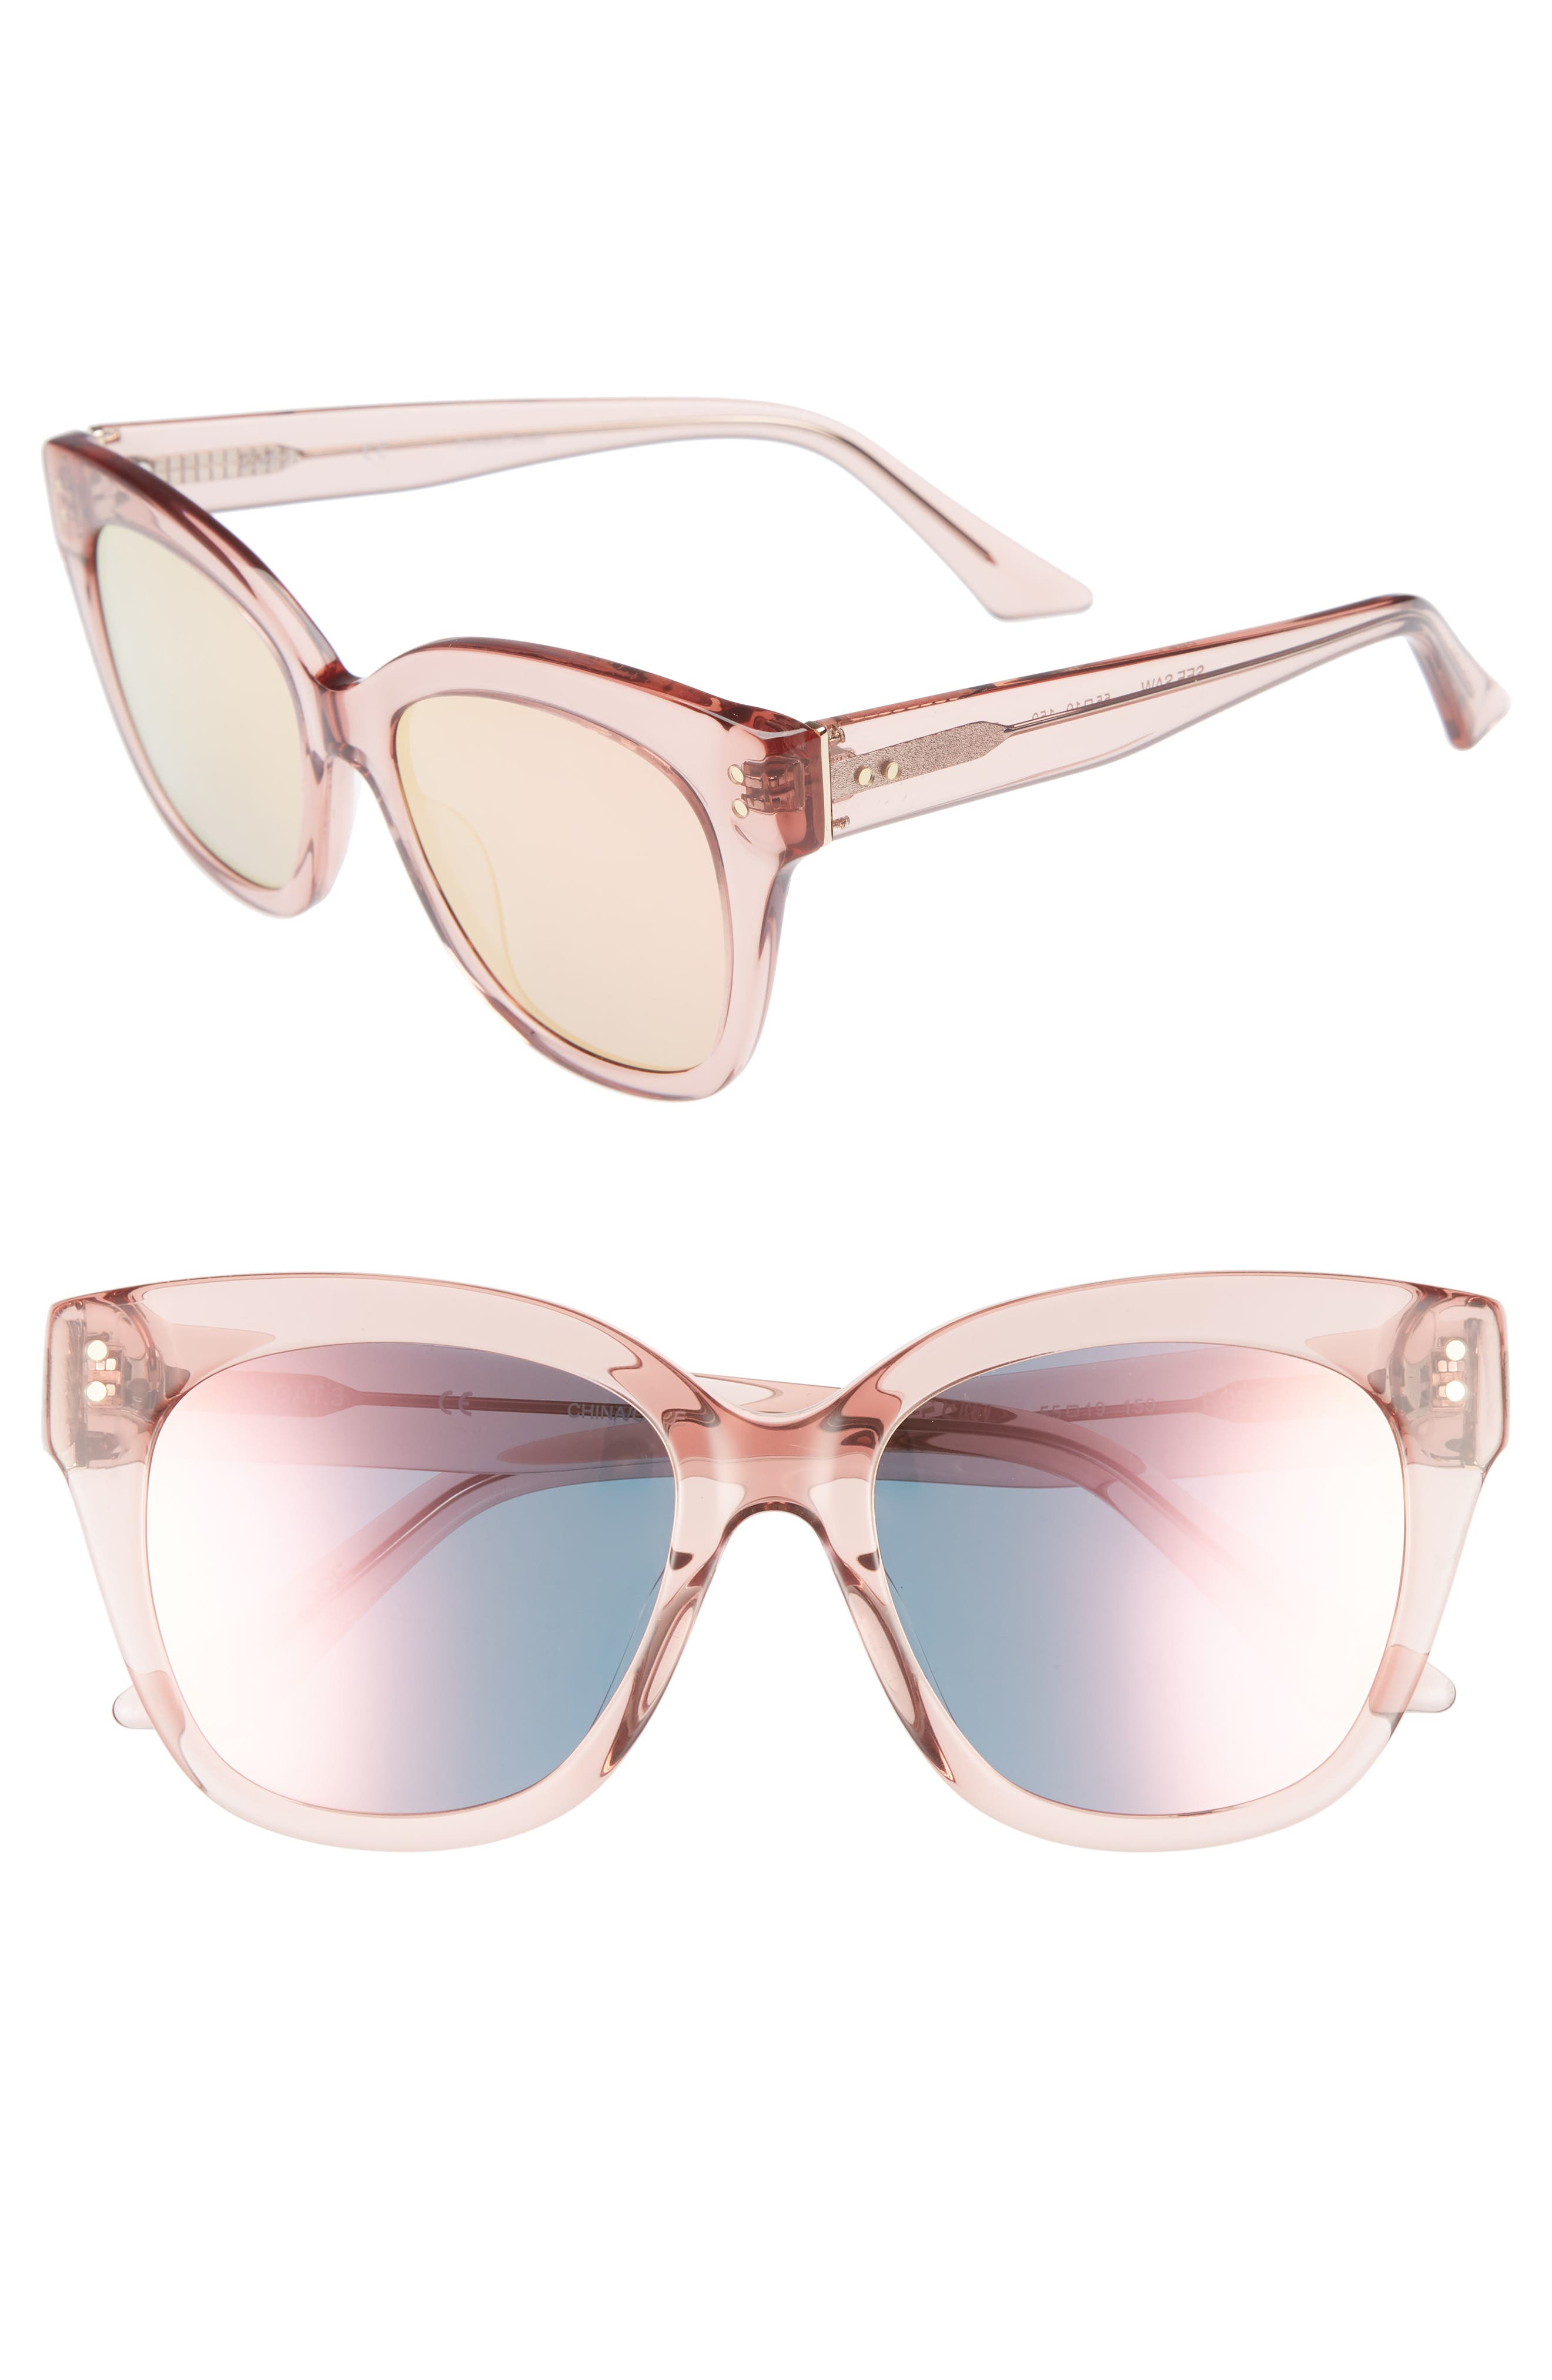 See Saw 55mm Cat Eye Sunglasses,                             Main thumbnail 1, color,                             650